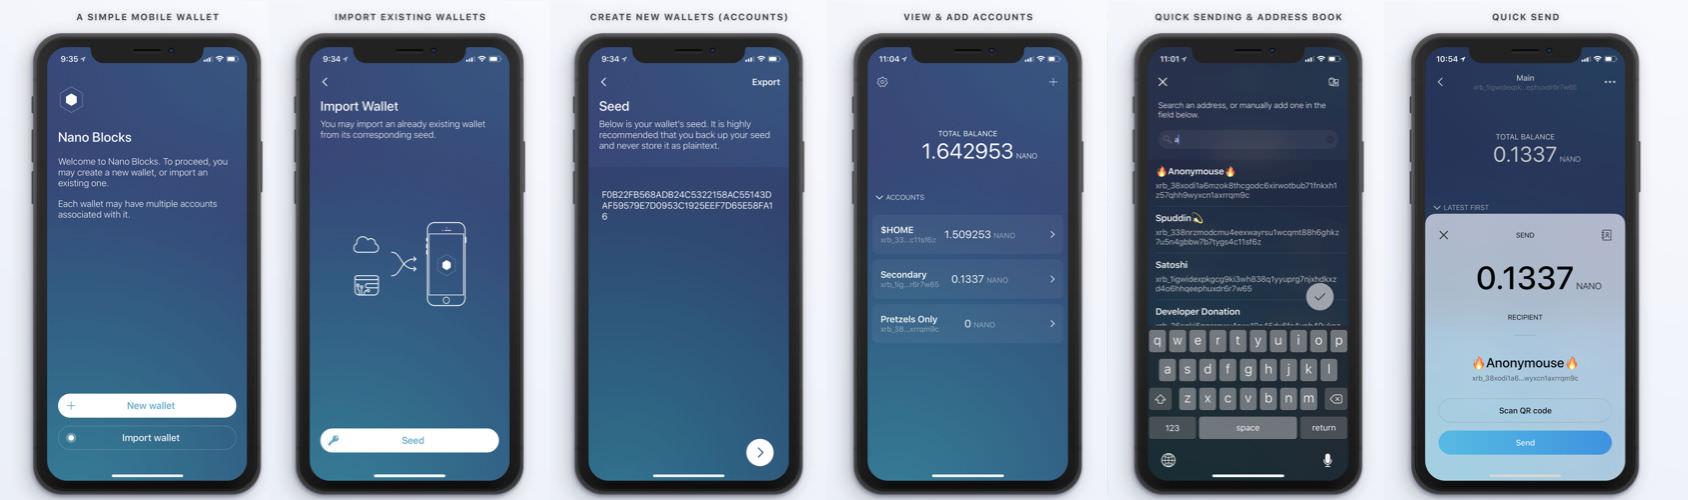 📸 screenshots of the app